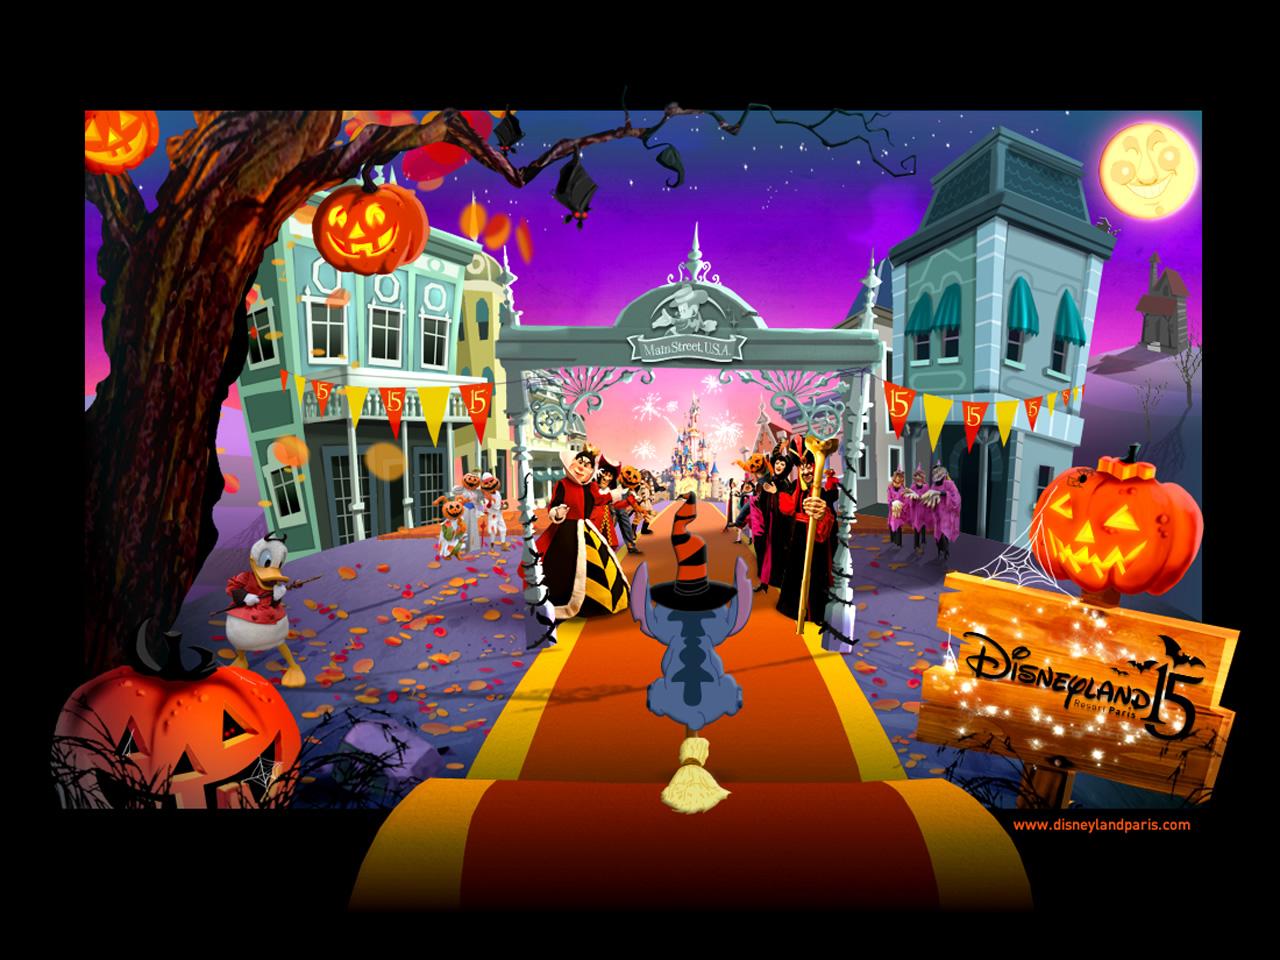 1280x960 Disney Halloween desktop PC and Mac wallpaper 1280x960